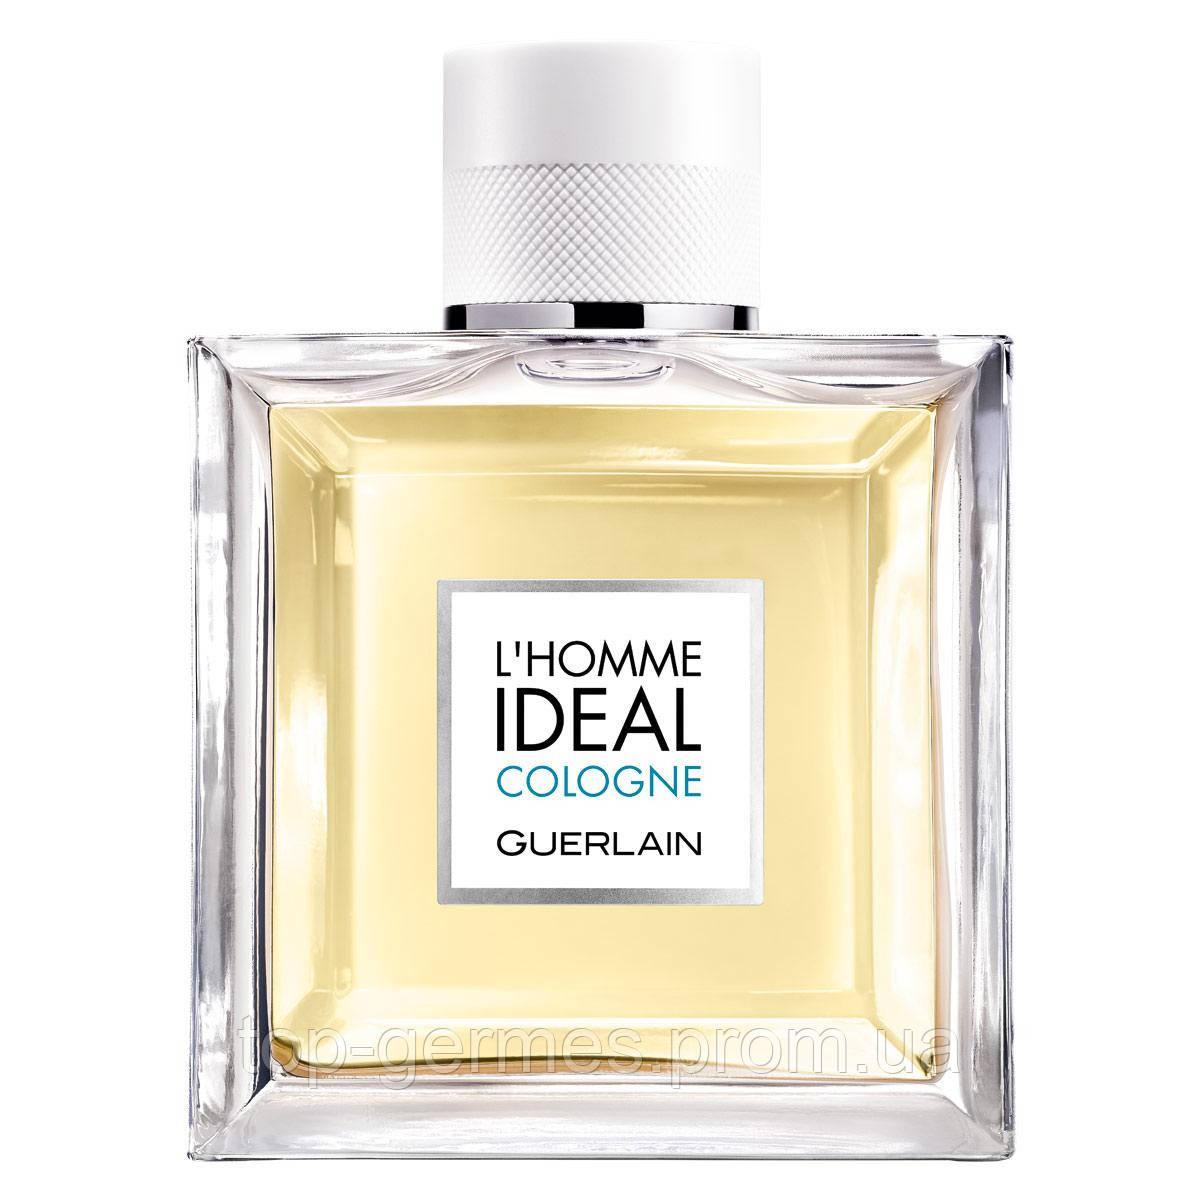 LHOMME IDEAL cologne парфюмированная вода муж-100% оригинал 1мл